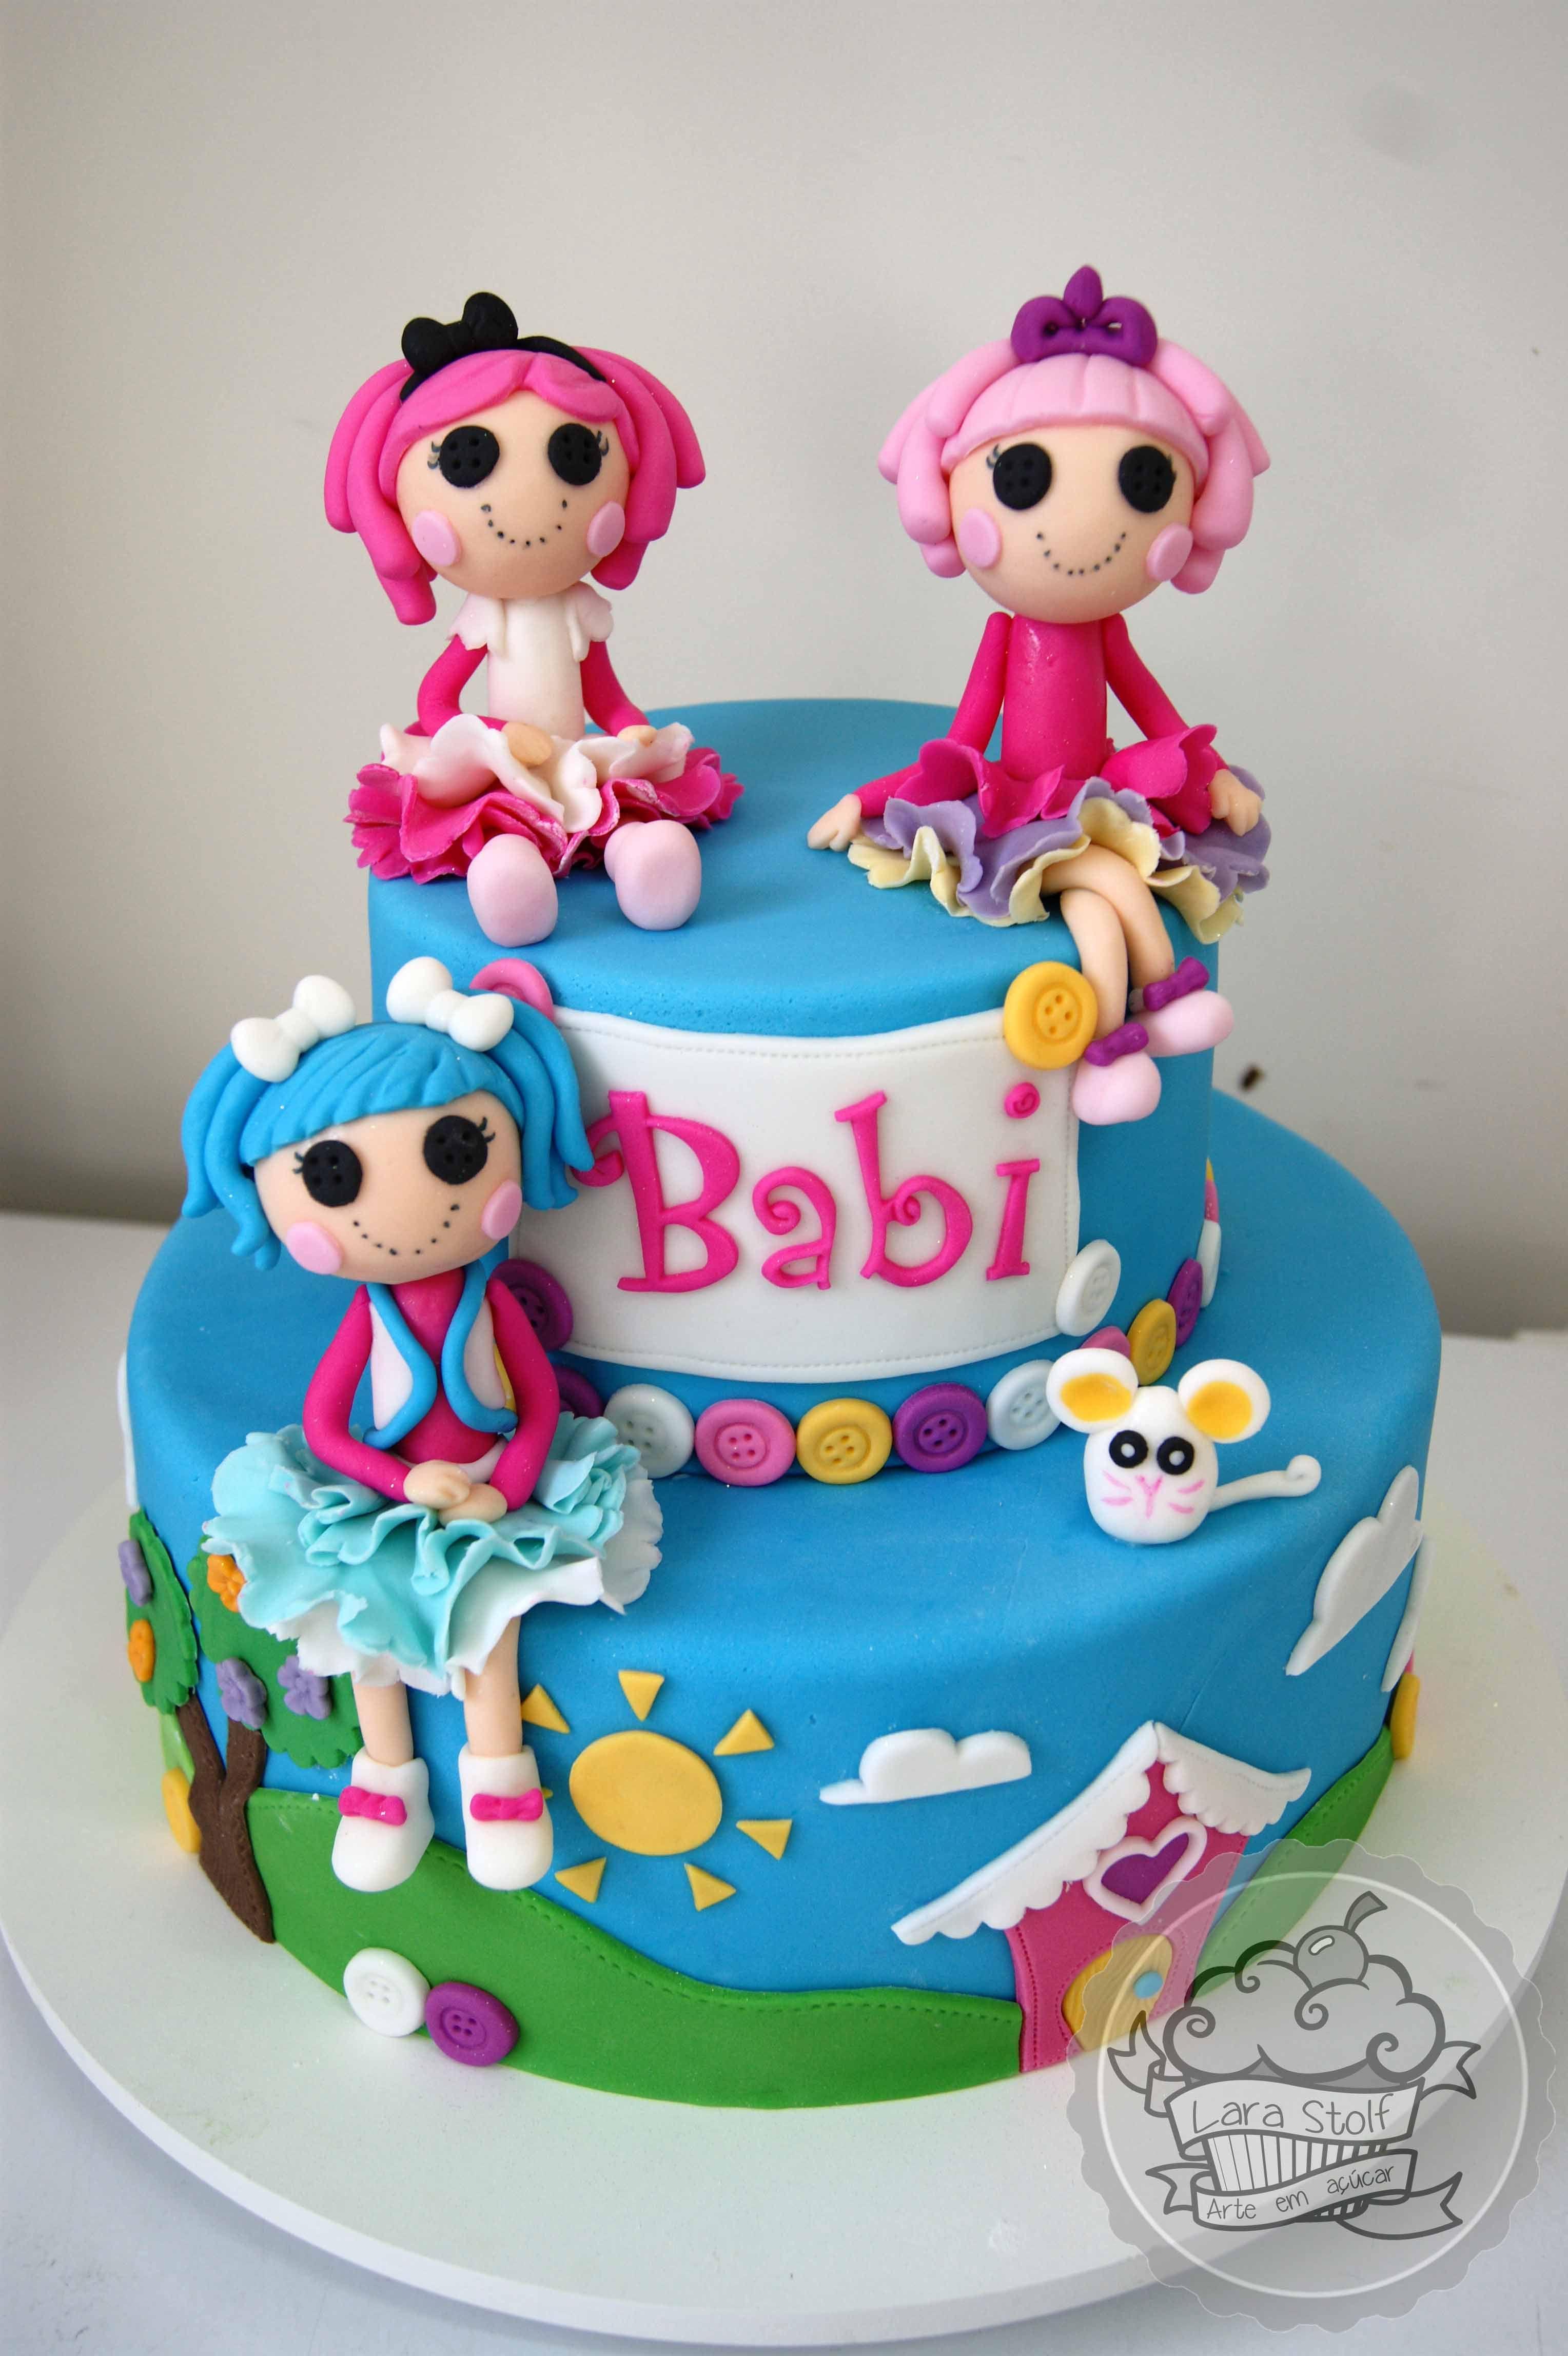 Lalaloopsy Cake With Edible Decorations Bolo Lalaloopsy Com